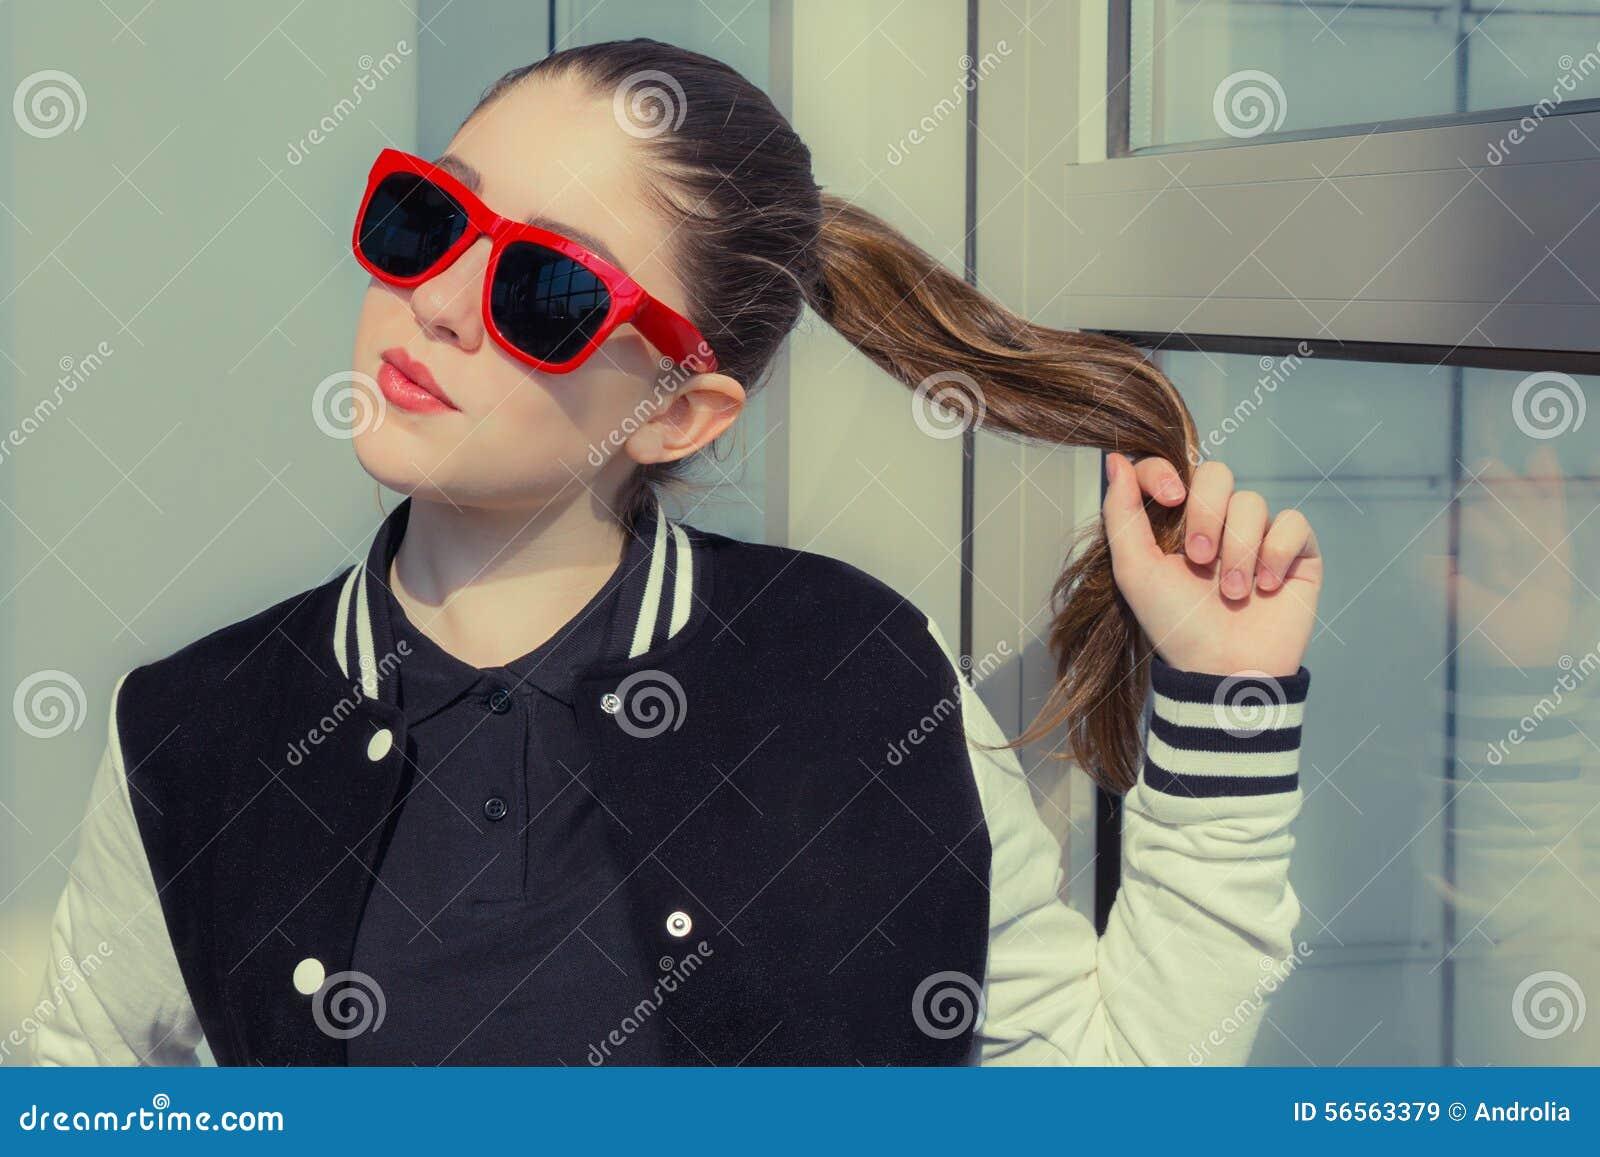 Download Πορτρέτο ενός μοντέρνου κοριτσιού στα κόκκινα γυαλιά ηλίου Στοκ Εικόνα - εικόνα από μοντέλο, μόδα: 56563379